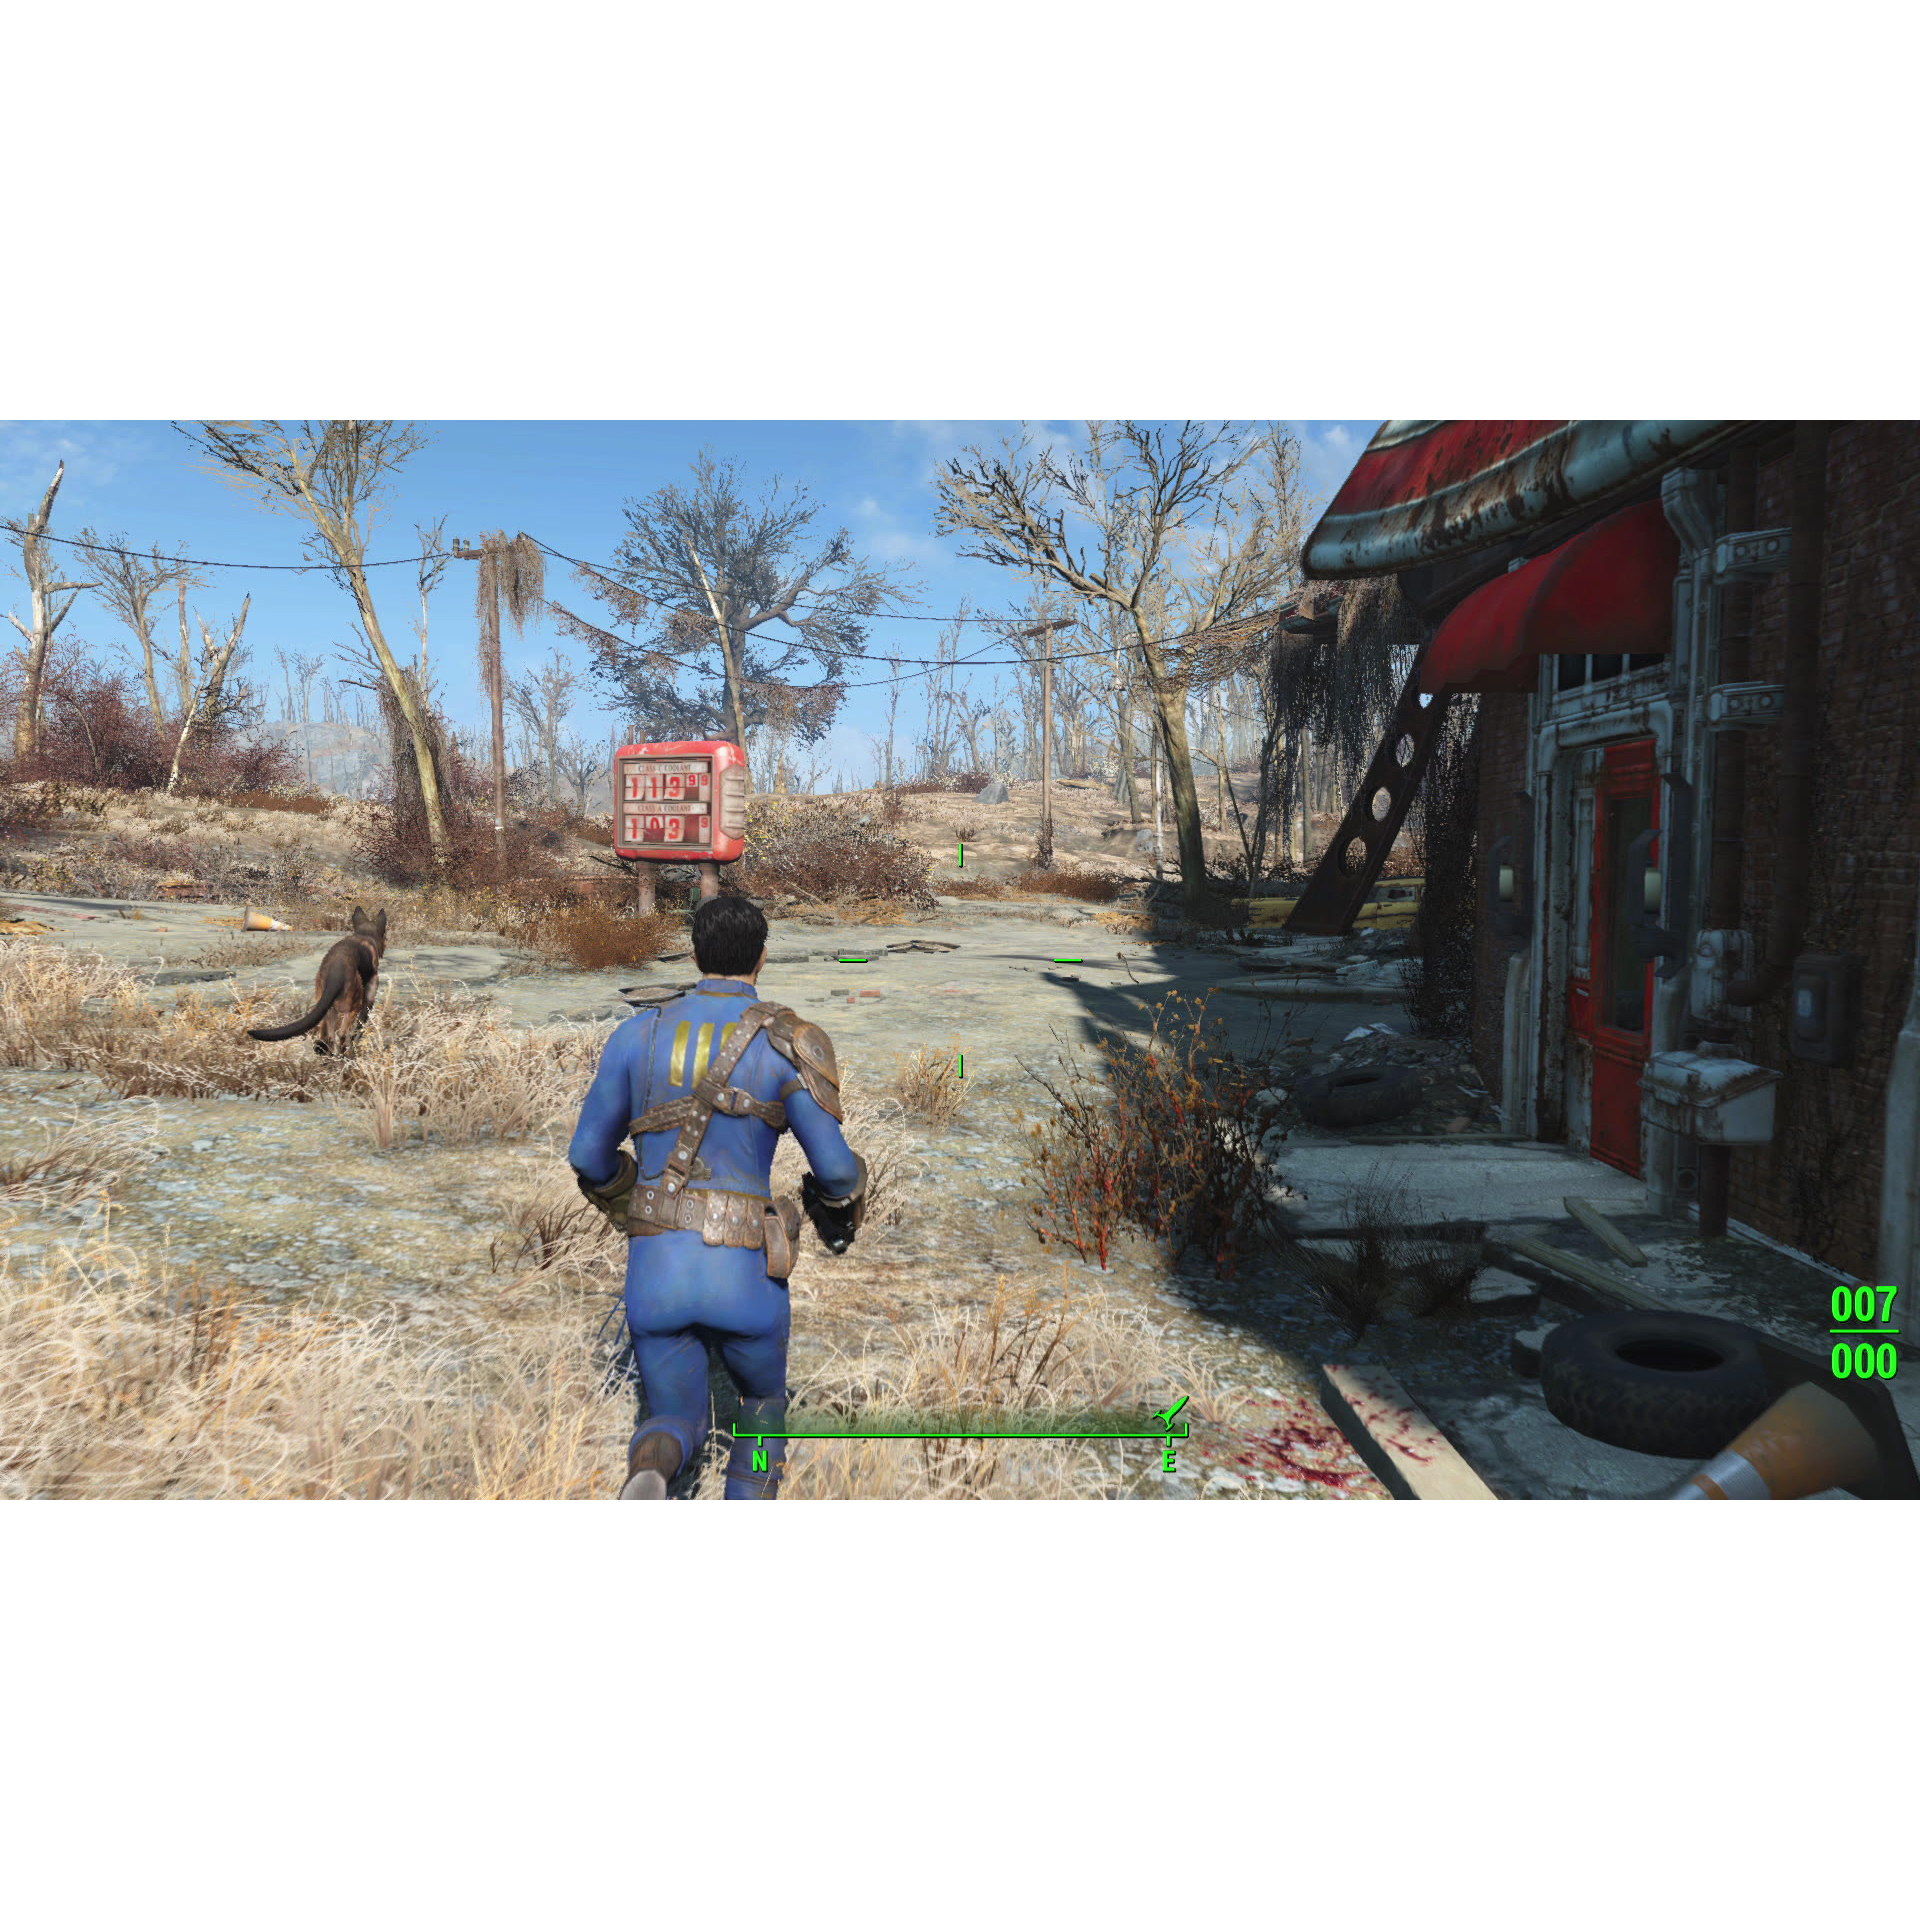 Joc Fallout 4 Goty pentru PlayStation 4 16